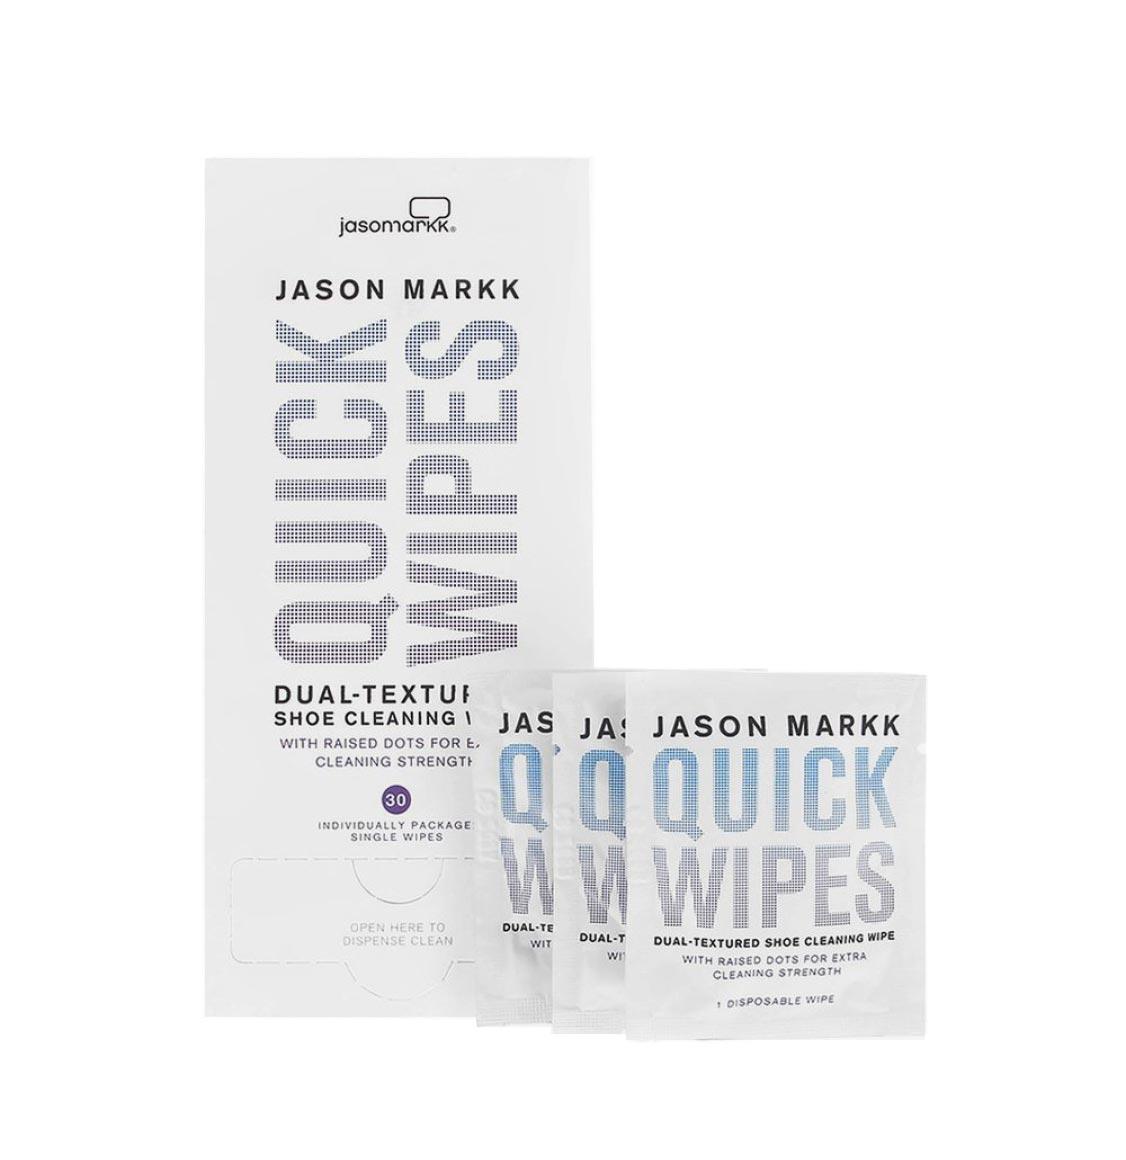 Jason Markk Pack of 30 Quick Wipes